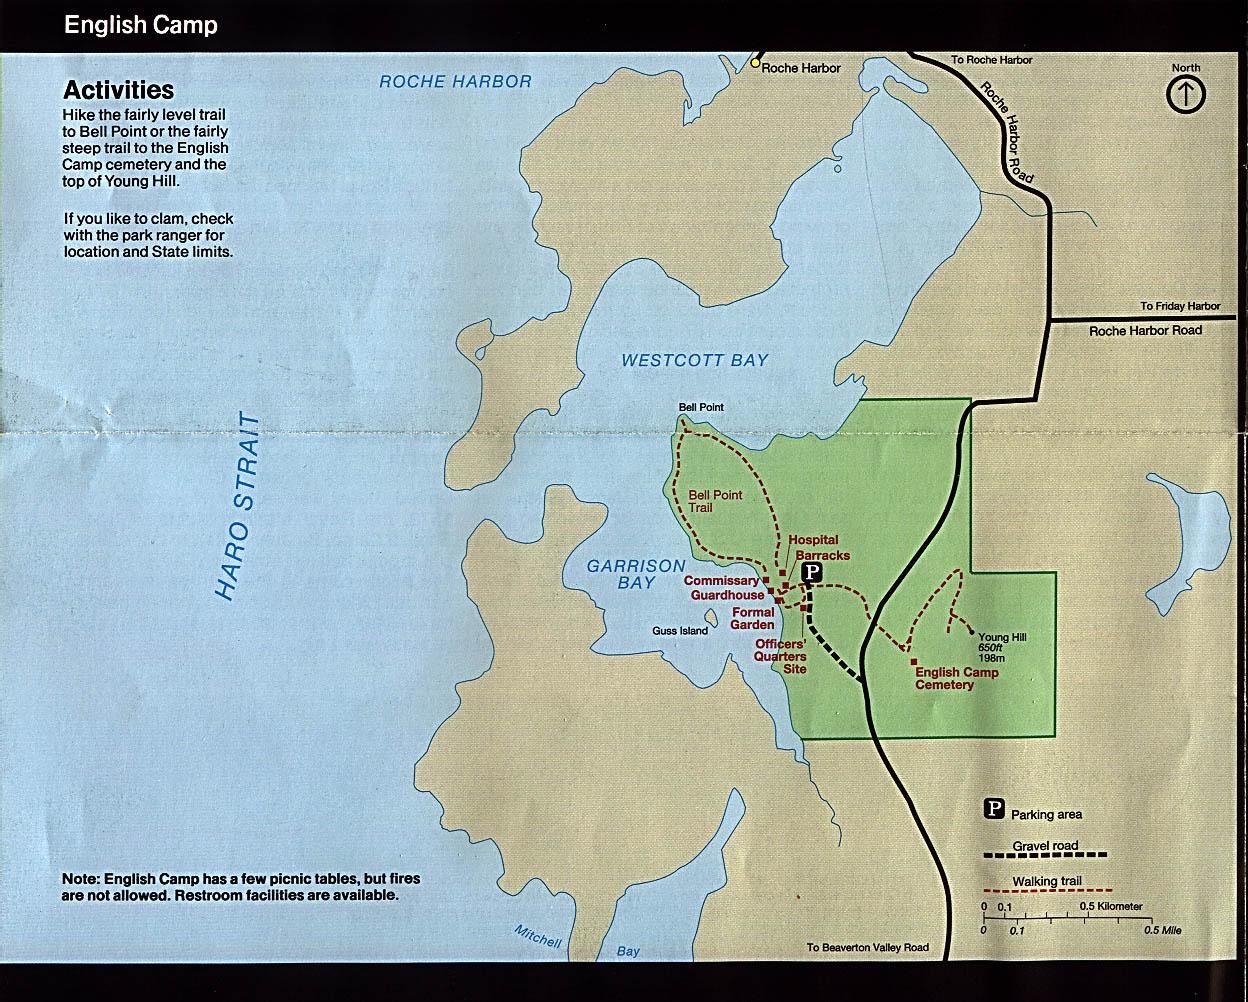 Maps of United States National Parks, Monuments and Historic Sites San Juan Island National Historical Park - English Camp [Washington] (Park Map) 1997 (323K)